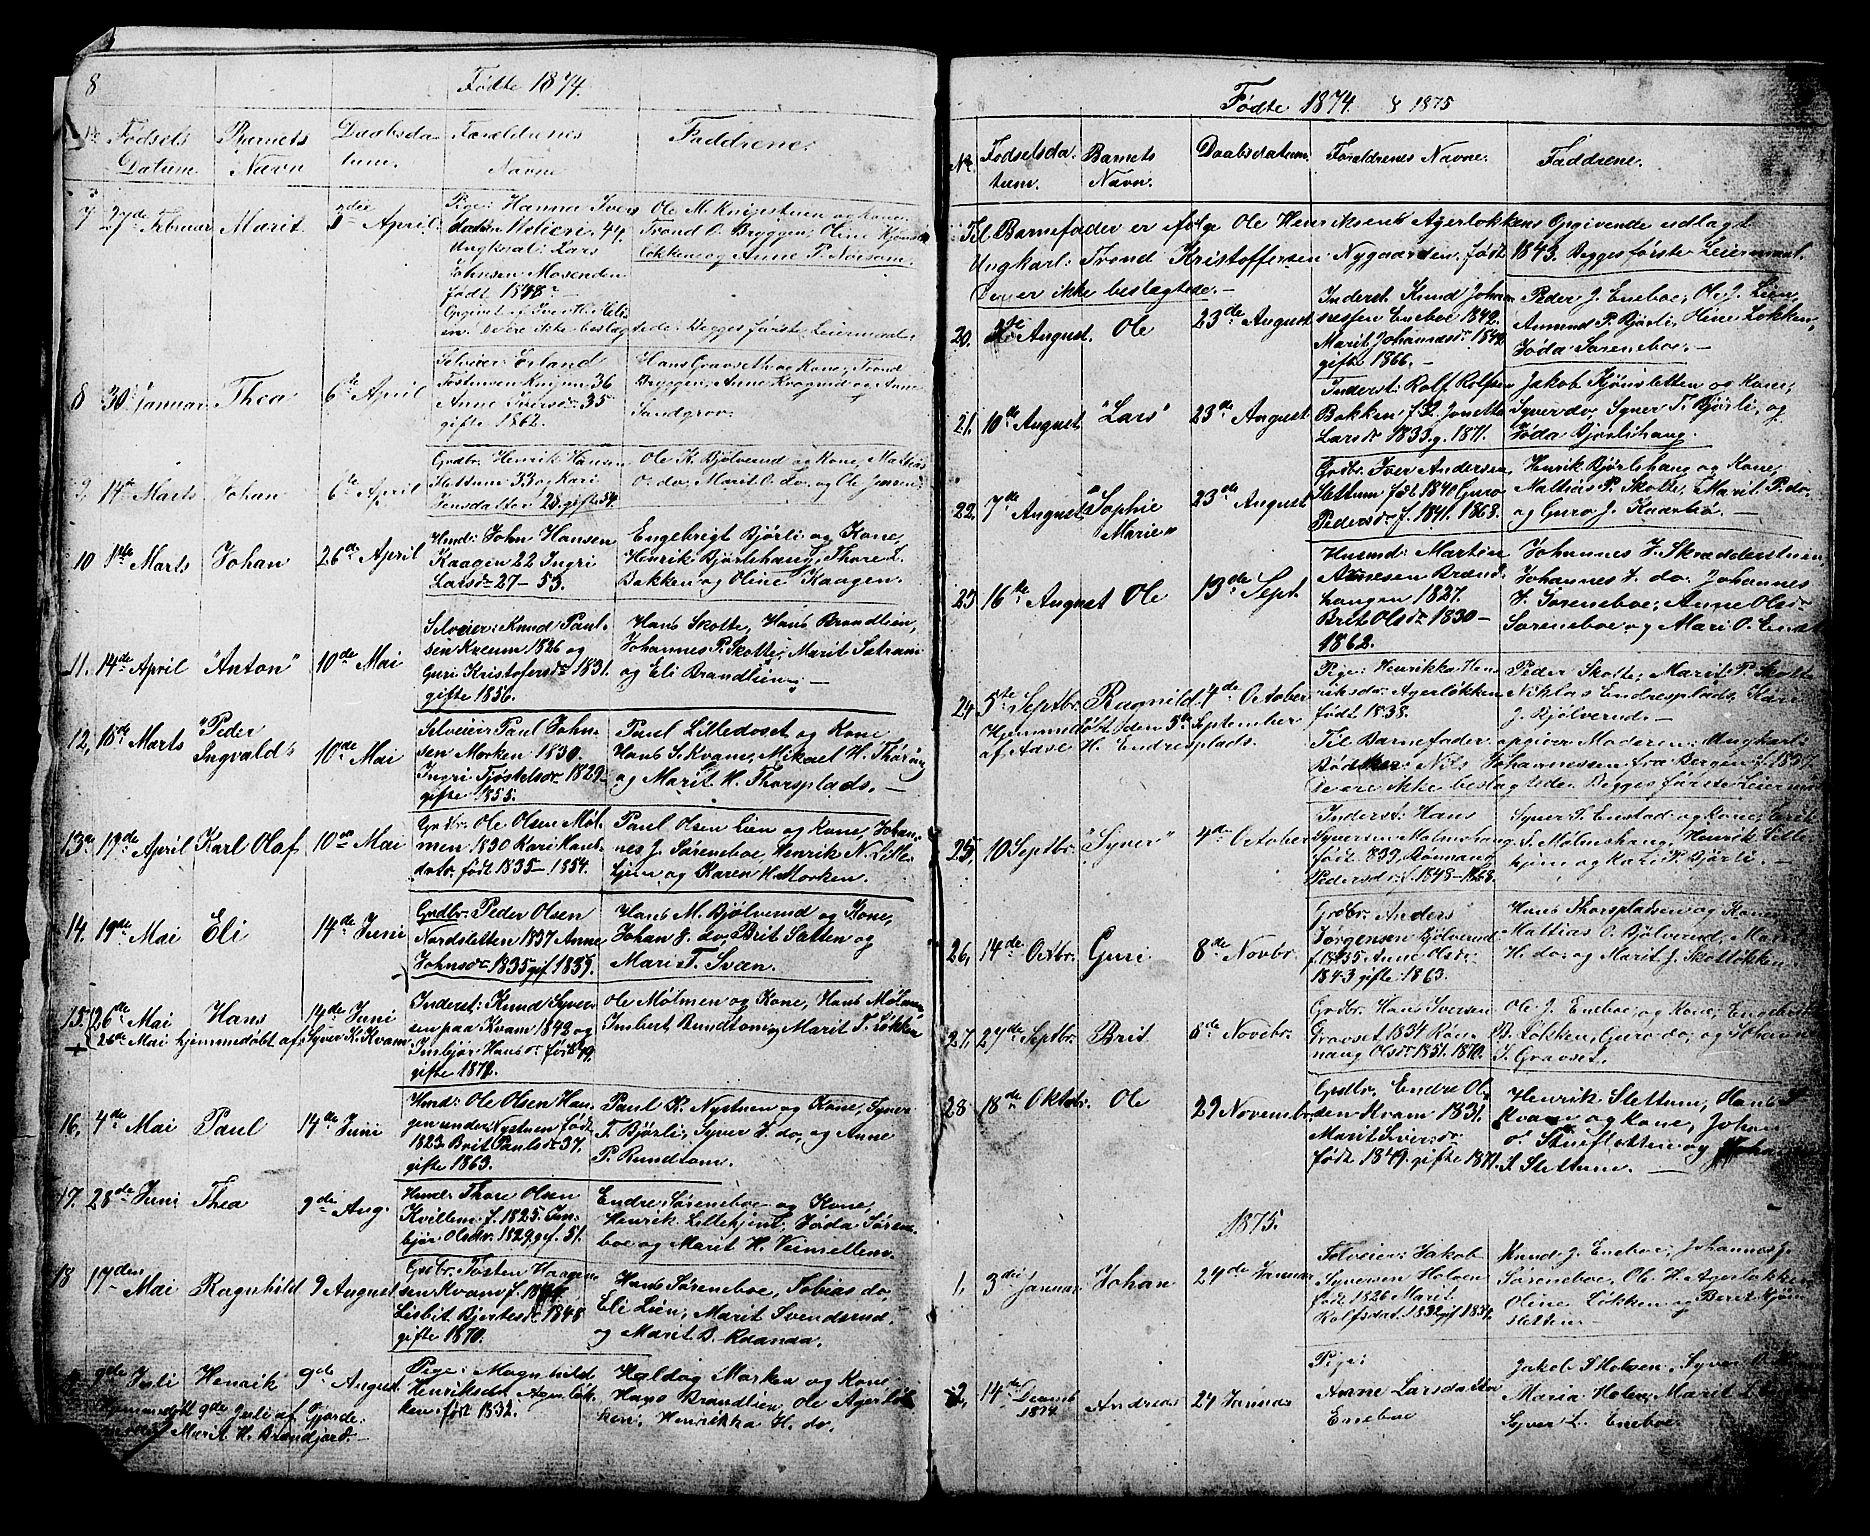 SAH, Lesja prestekontor, Klokkerbok nr. 6, 1871-1904, s. 8-9